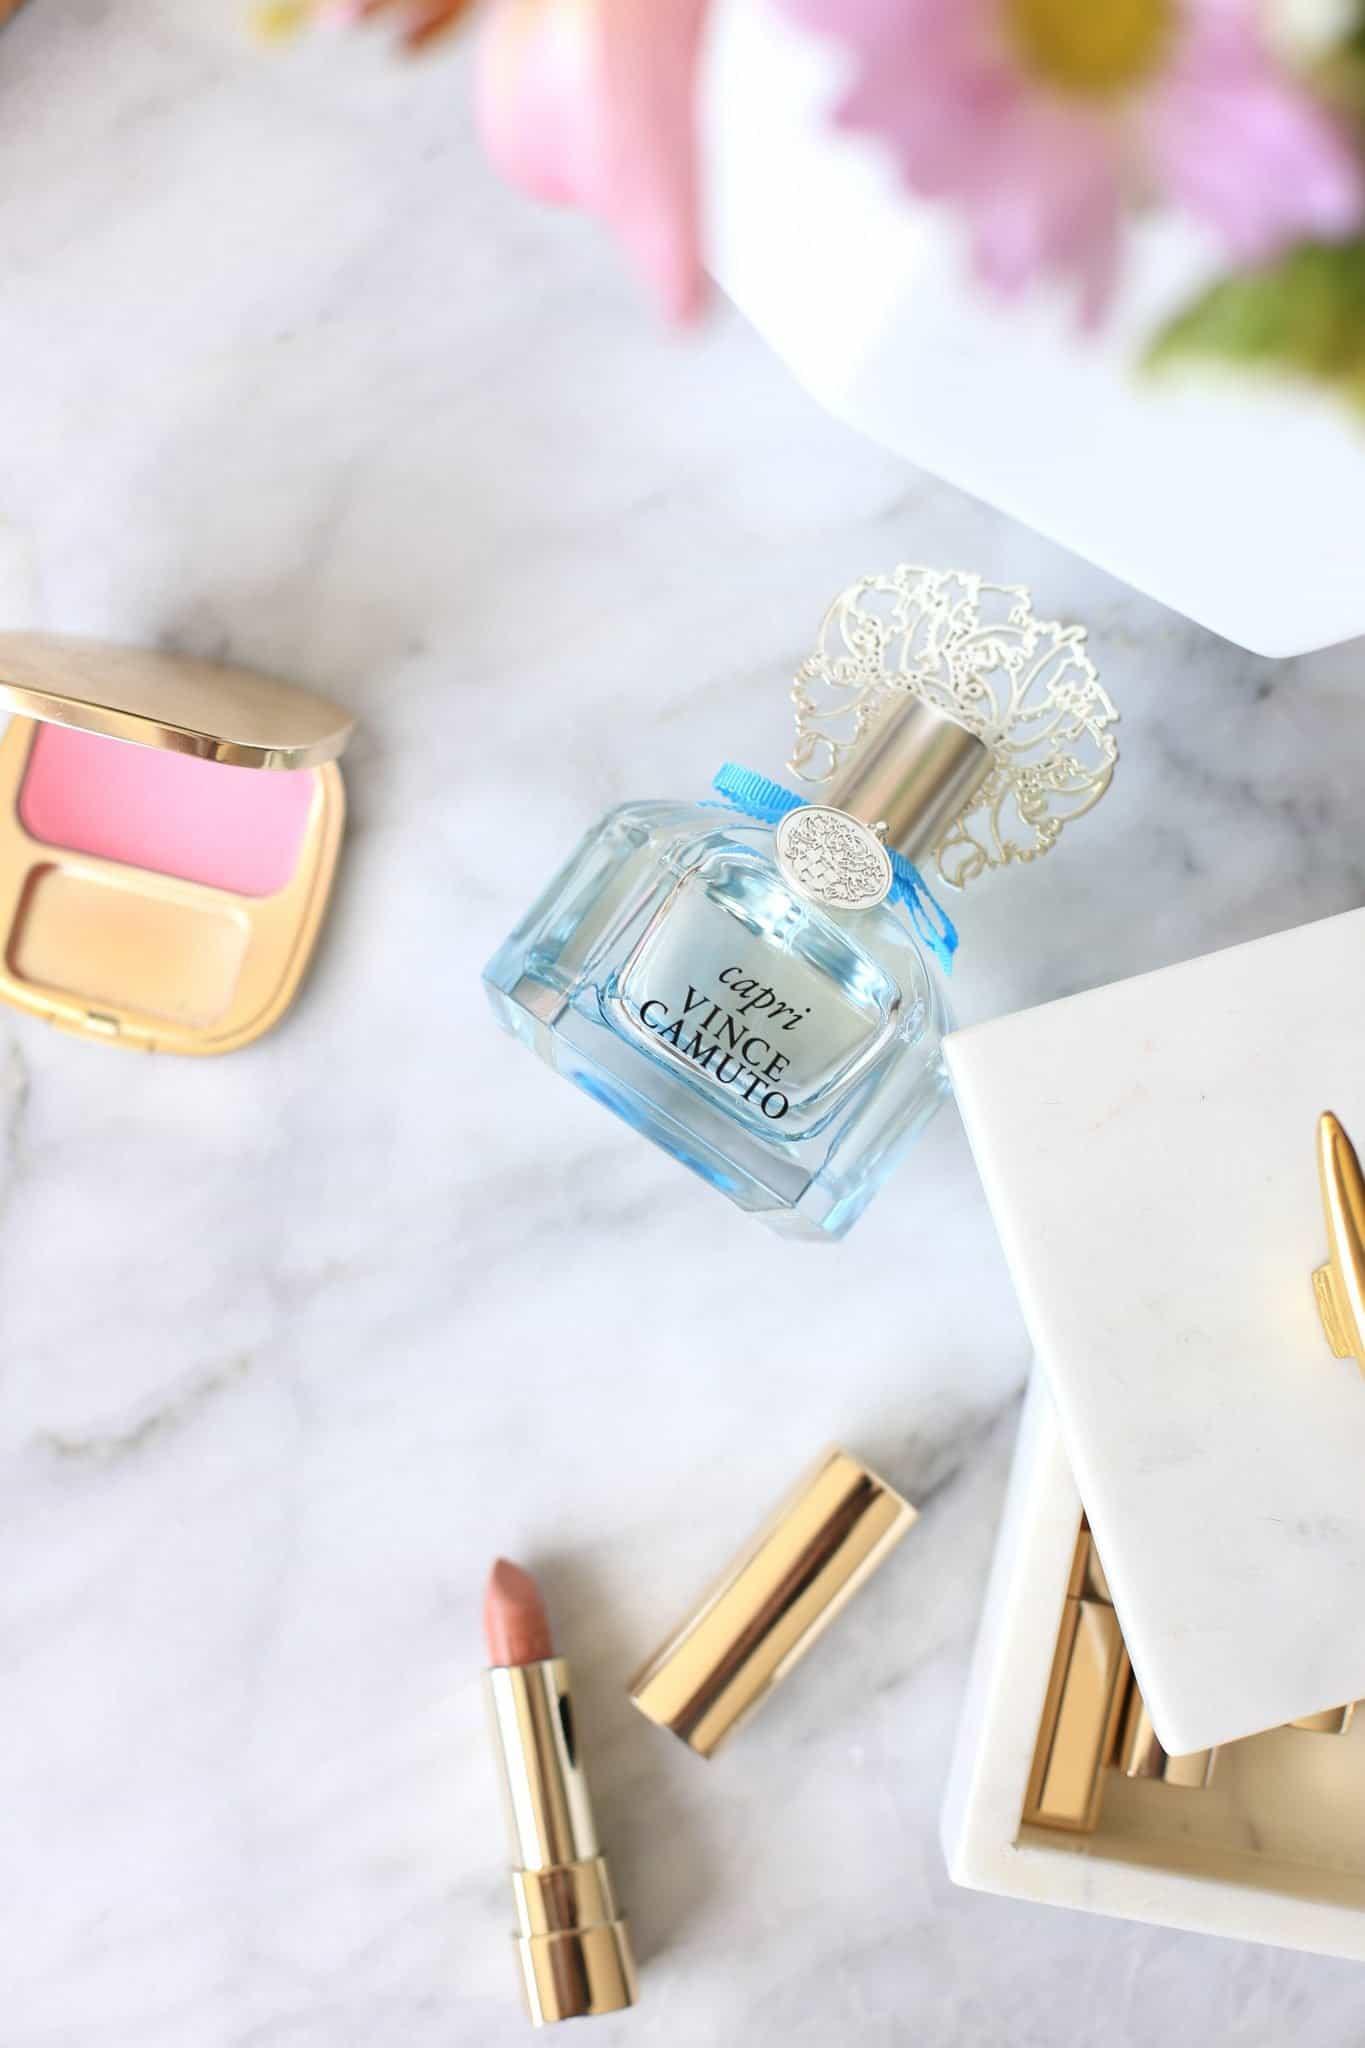 capri vince camuto fragrance - 1 (1)